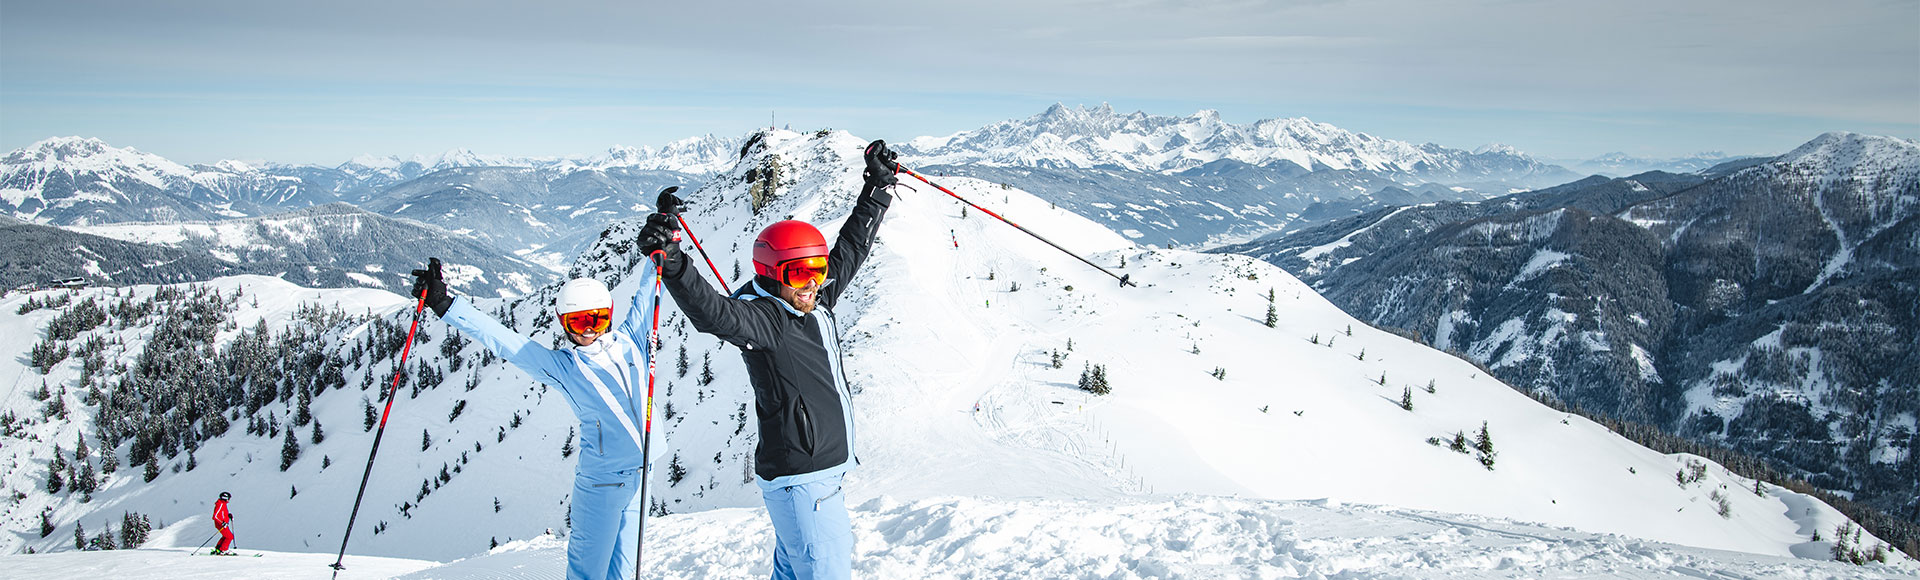 Skiurlaub Wagrain Kleinarl Salzburg 3